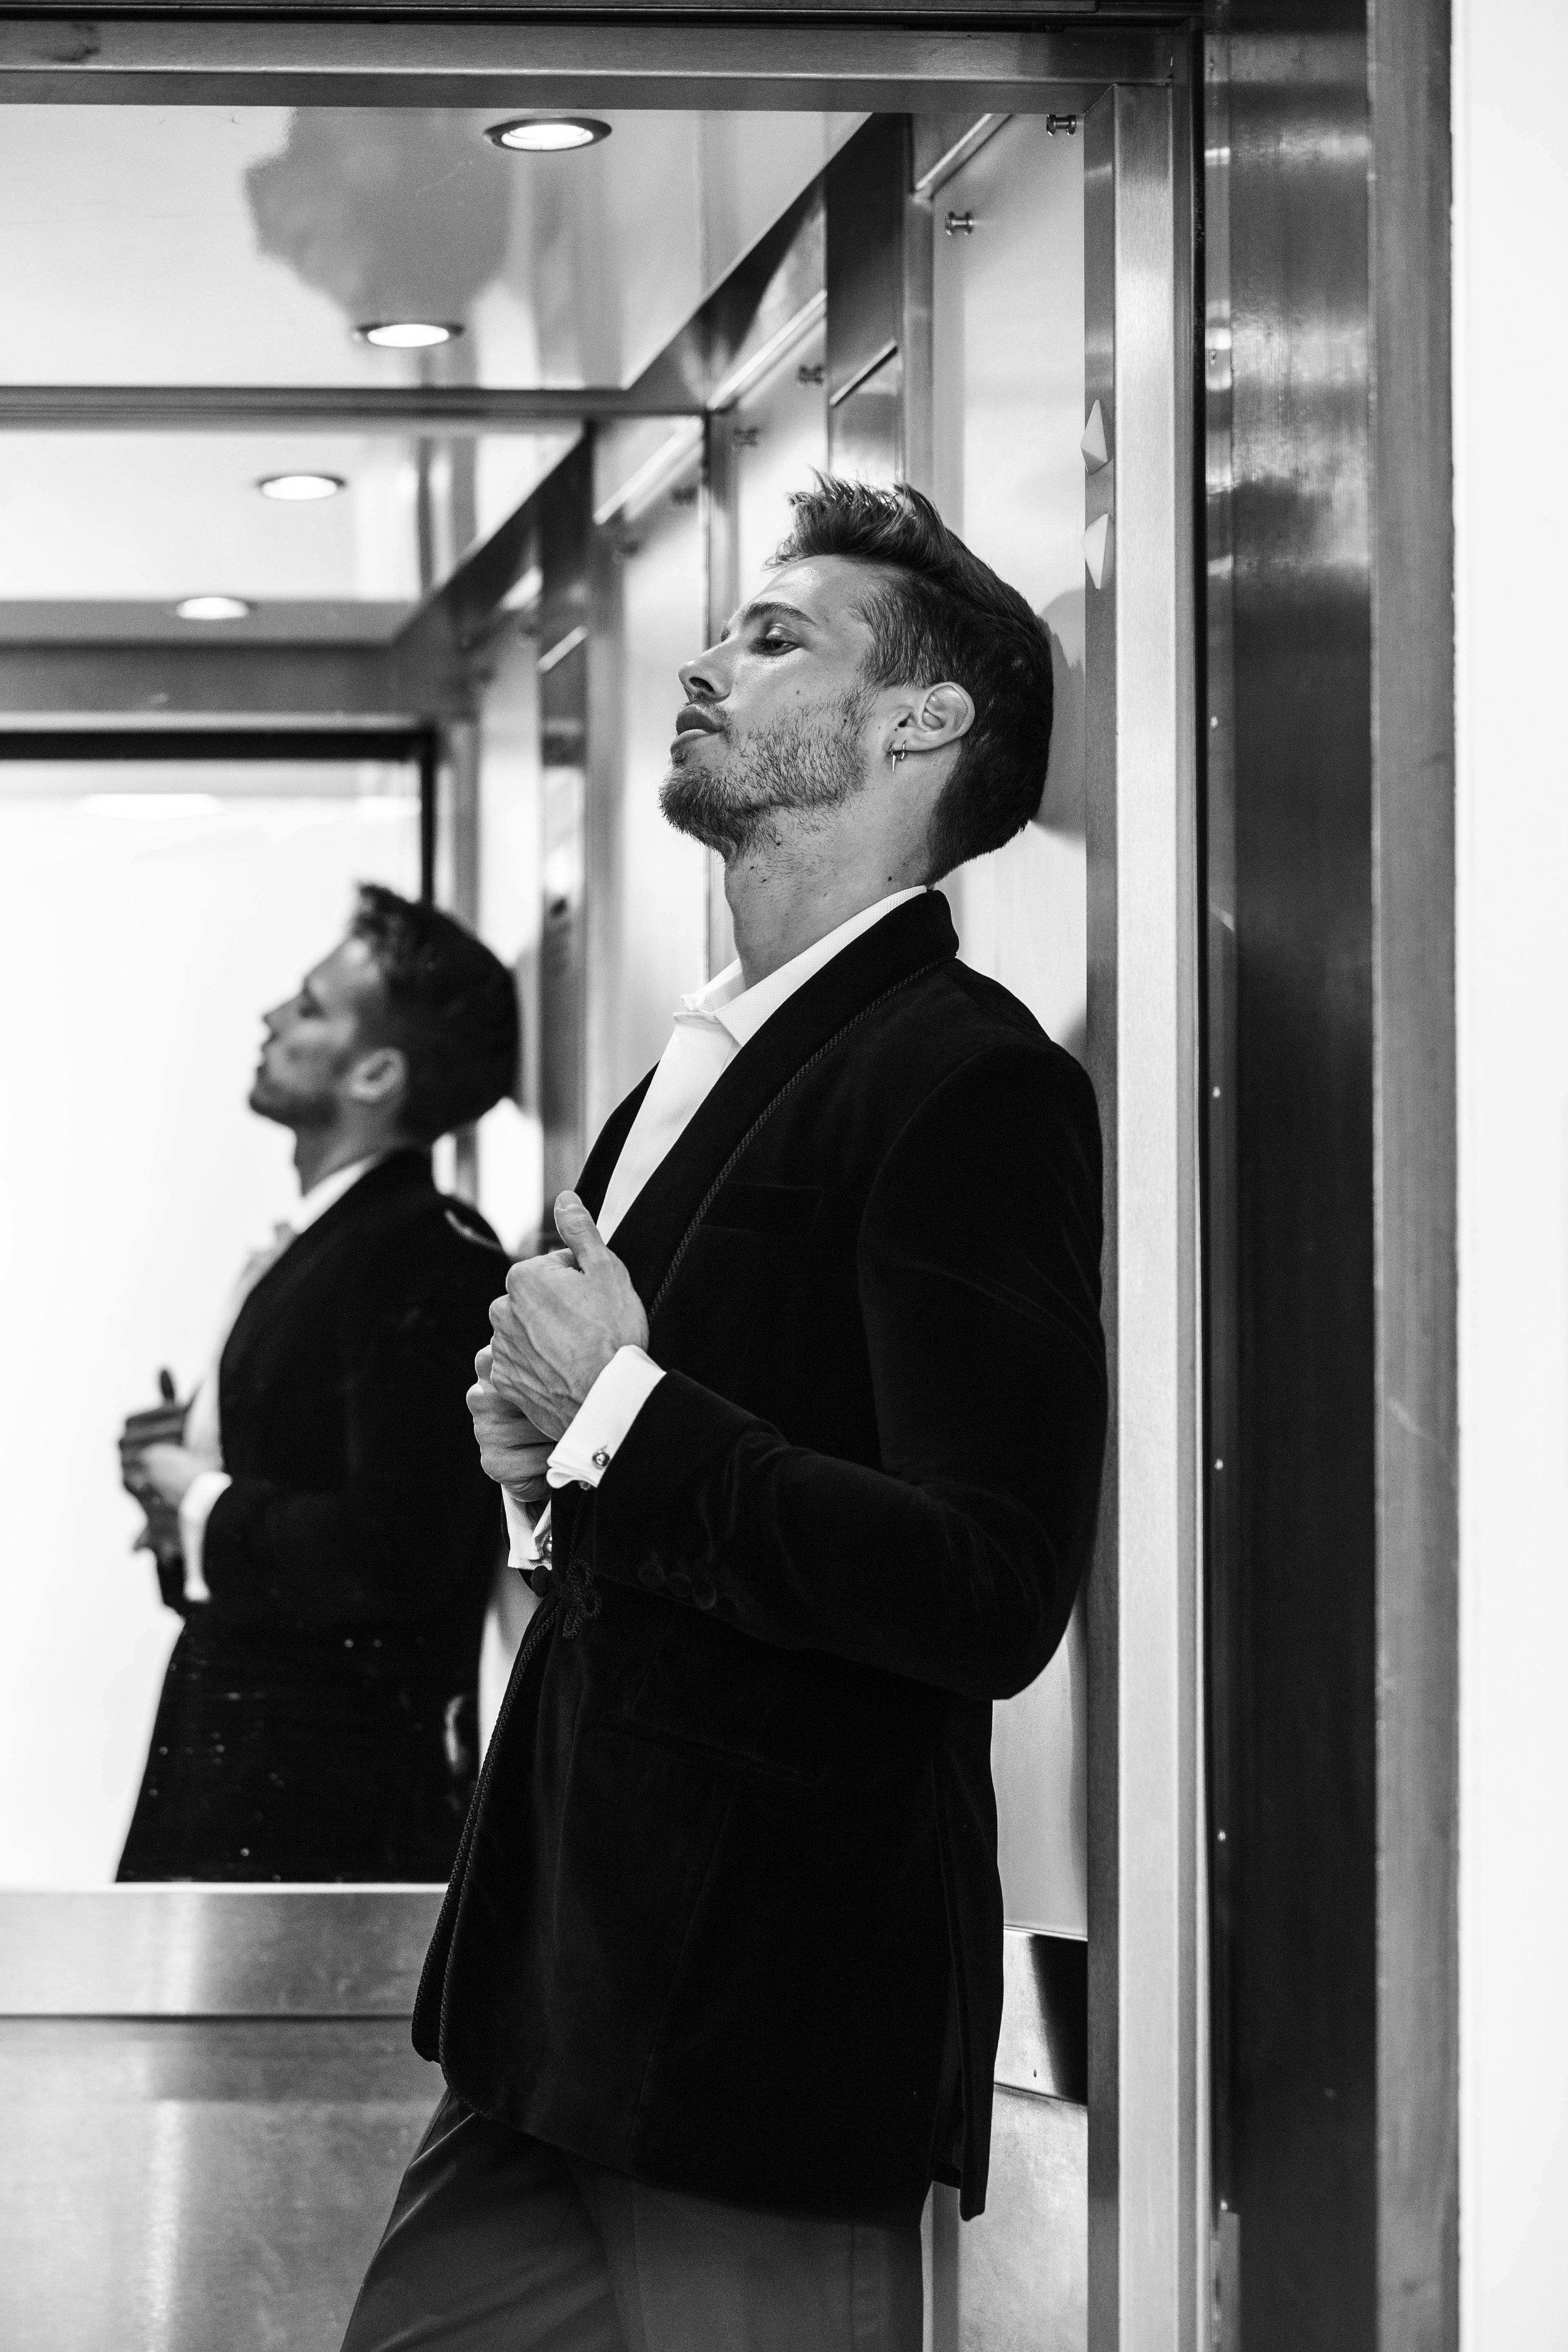 Suit & shirt -  Turnbull & Asser , Shoes -  J.M Weston